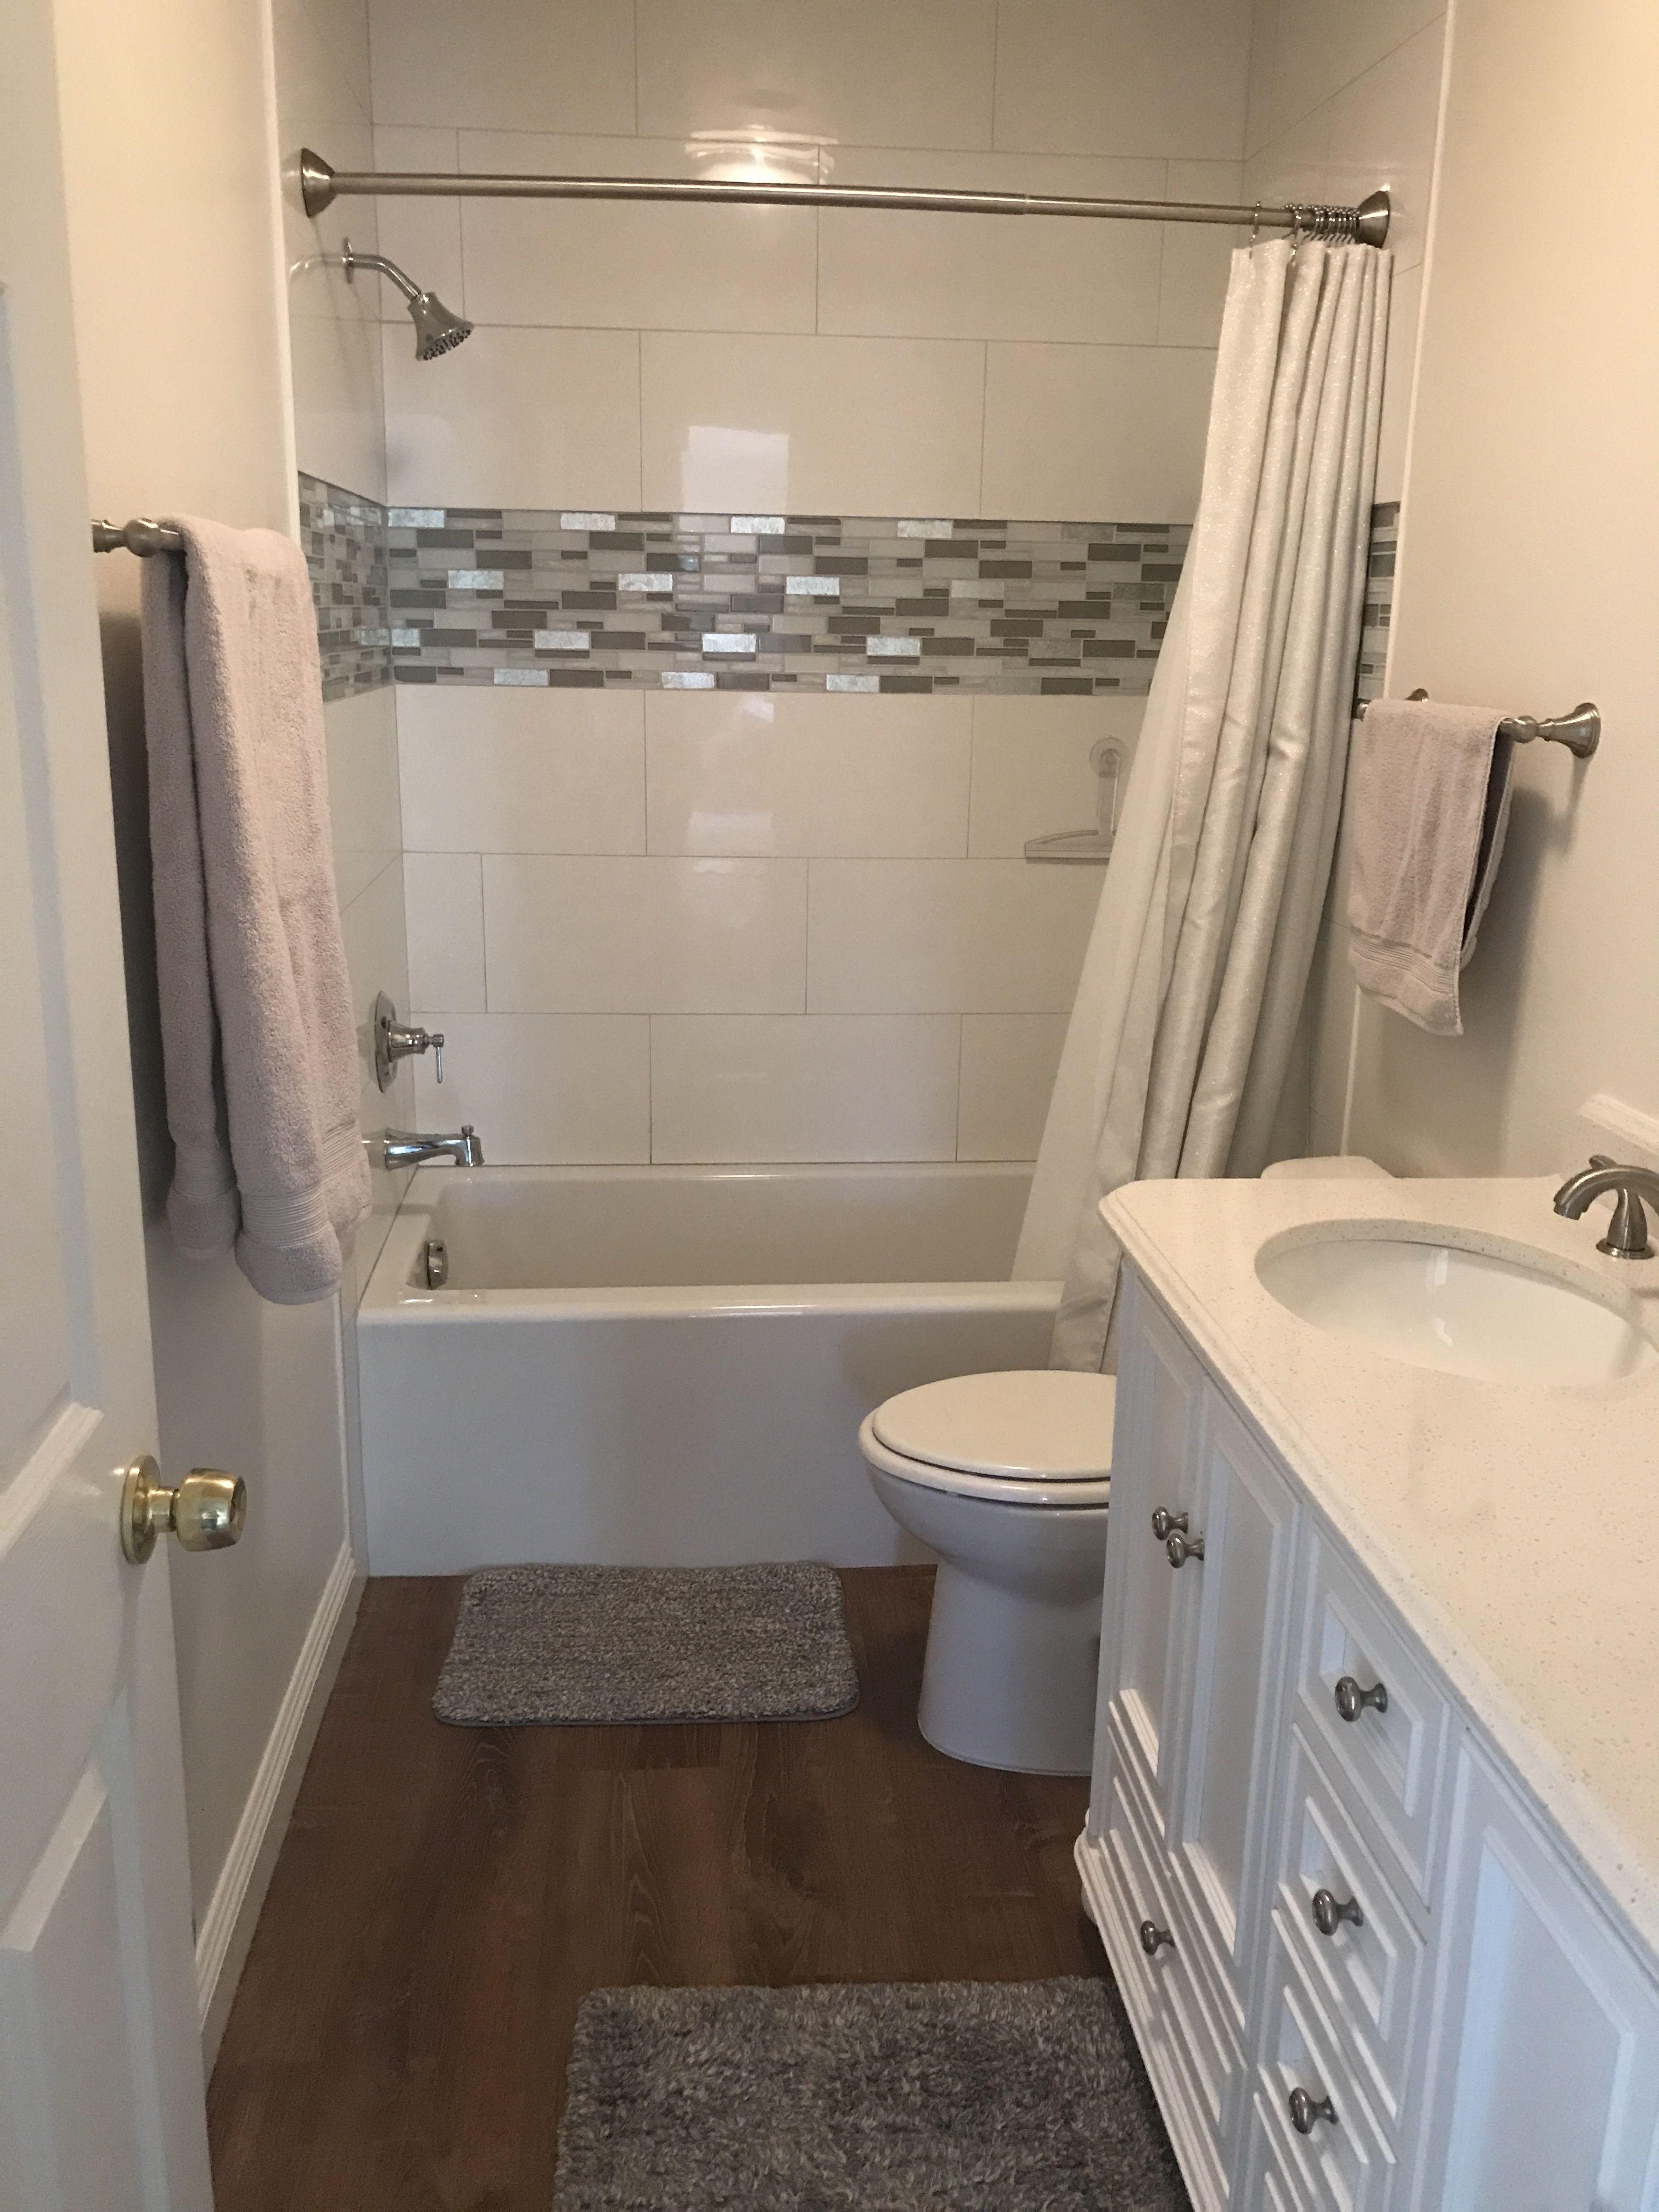 Remodel small bathroom Small bathroom remodel, Small